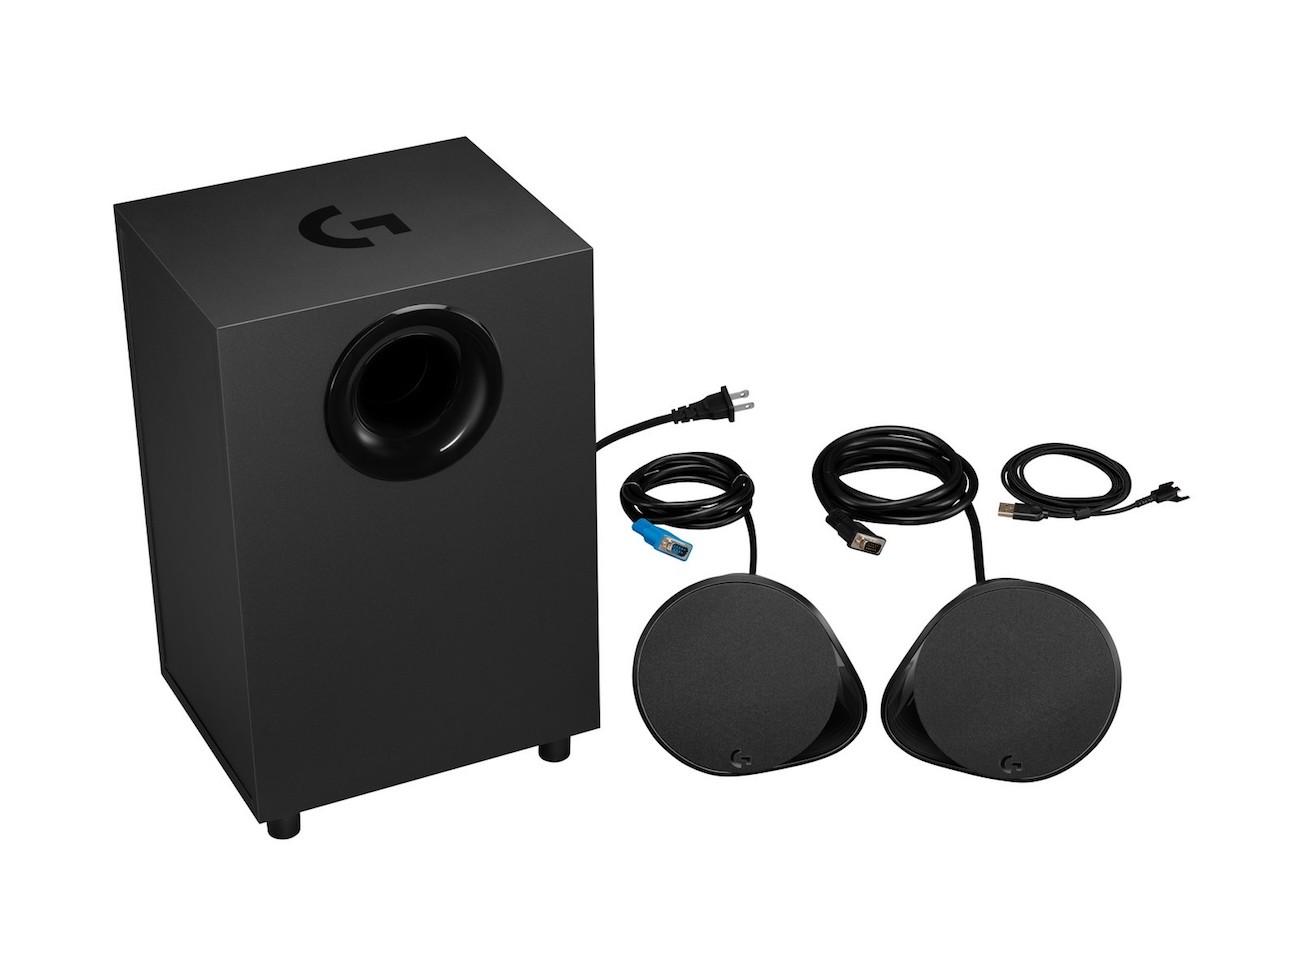 1ec647a101a Logitech G560 Lightsync PC Gaming Speakers » Gadget Flow